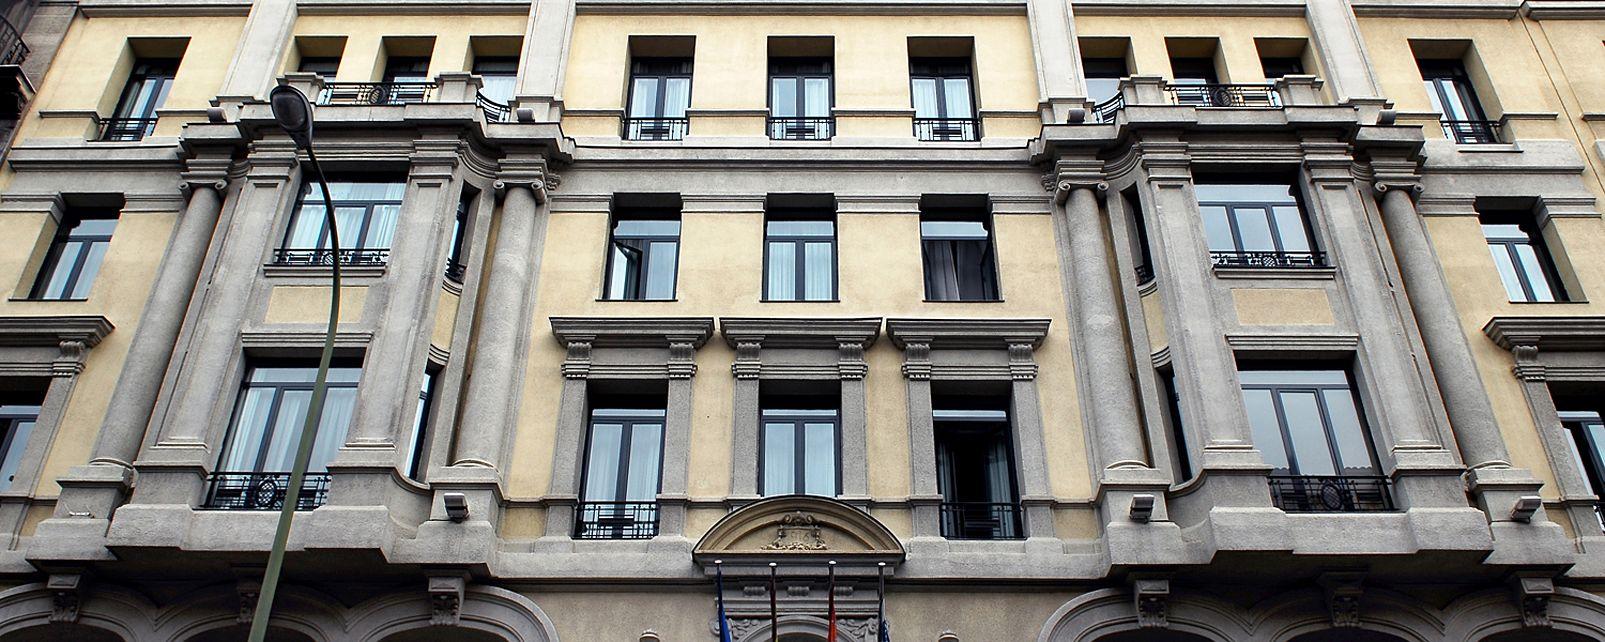 Hotel Tryp Atocha